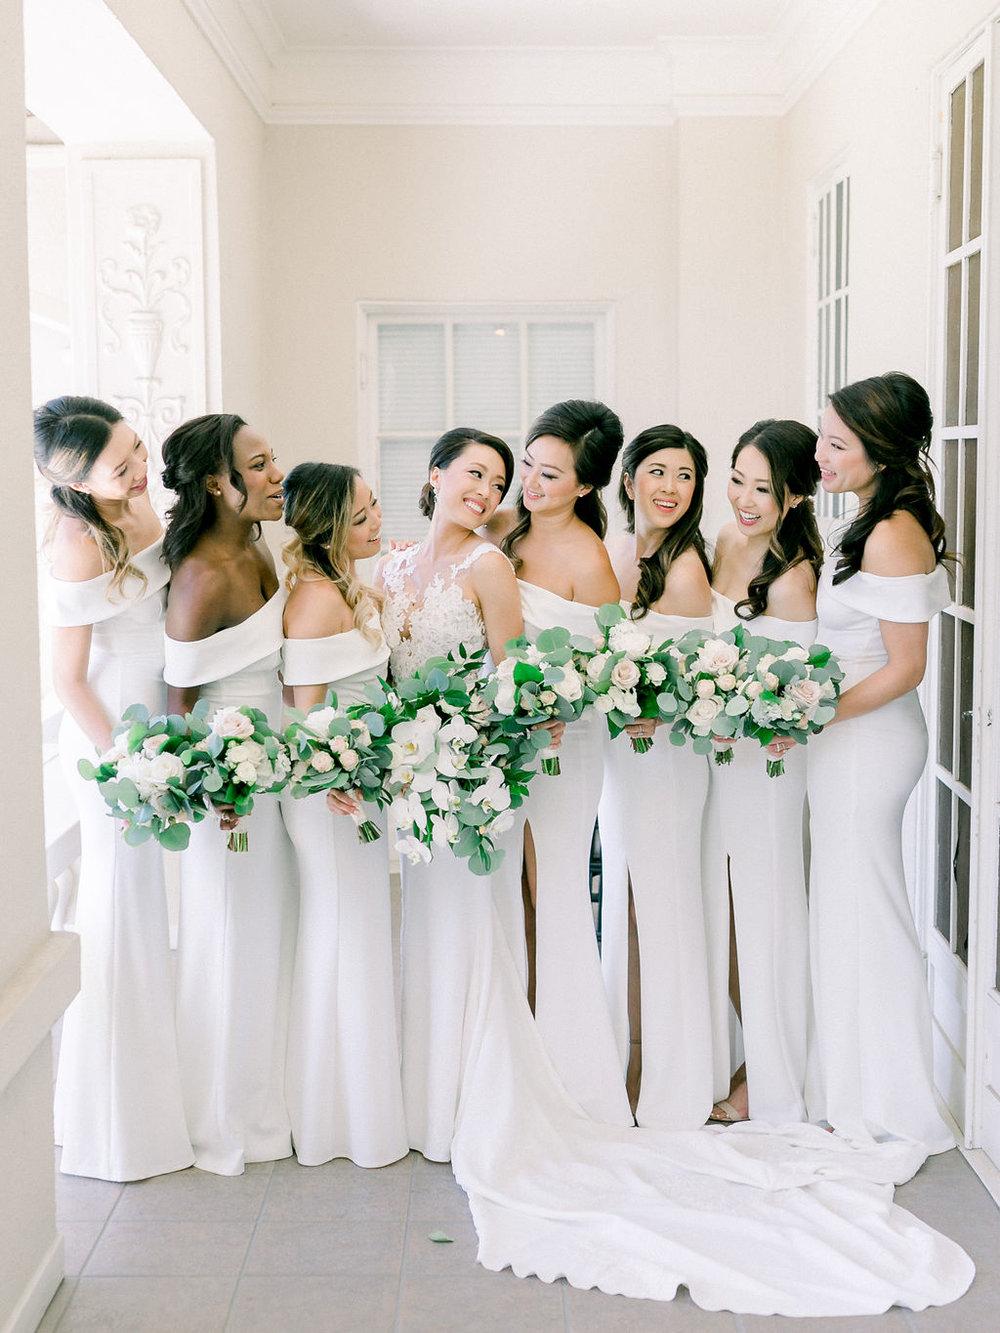 JennySoiPhotography-DCGettingReady-159.jpgFilm Destination Wedding California Fine Art Photographer Jenny Soi - All White Wedding at Villa Montalvo Saratoga, CA